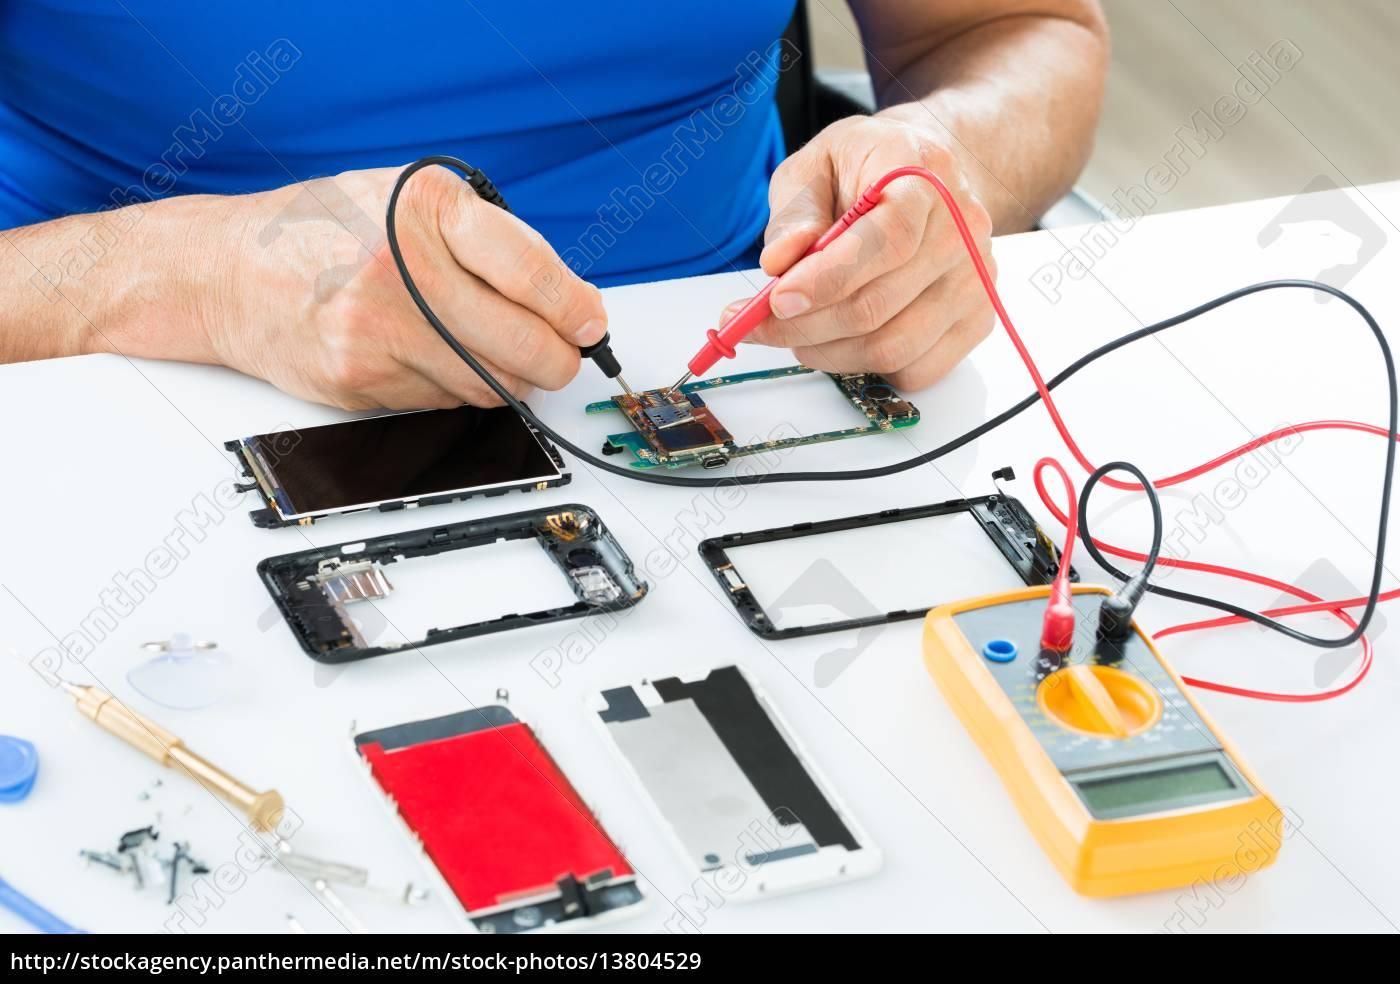 man, repairing, cellphone - 13804529